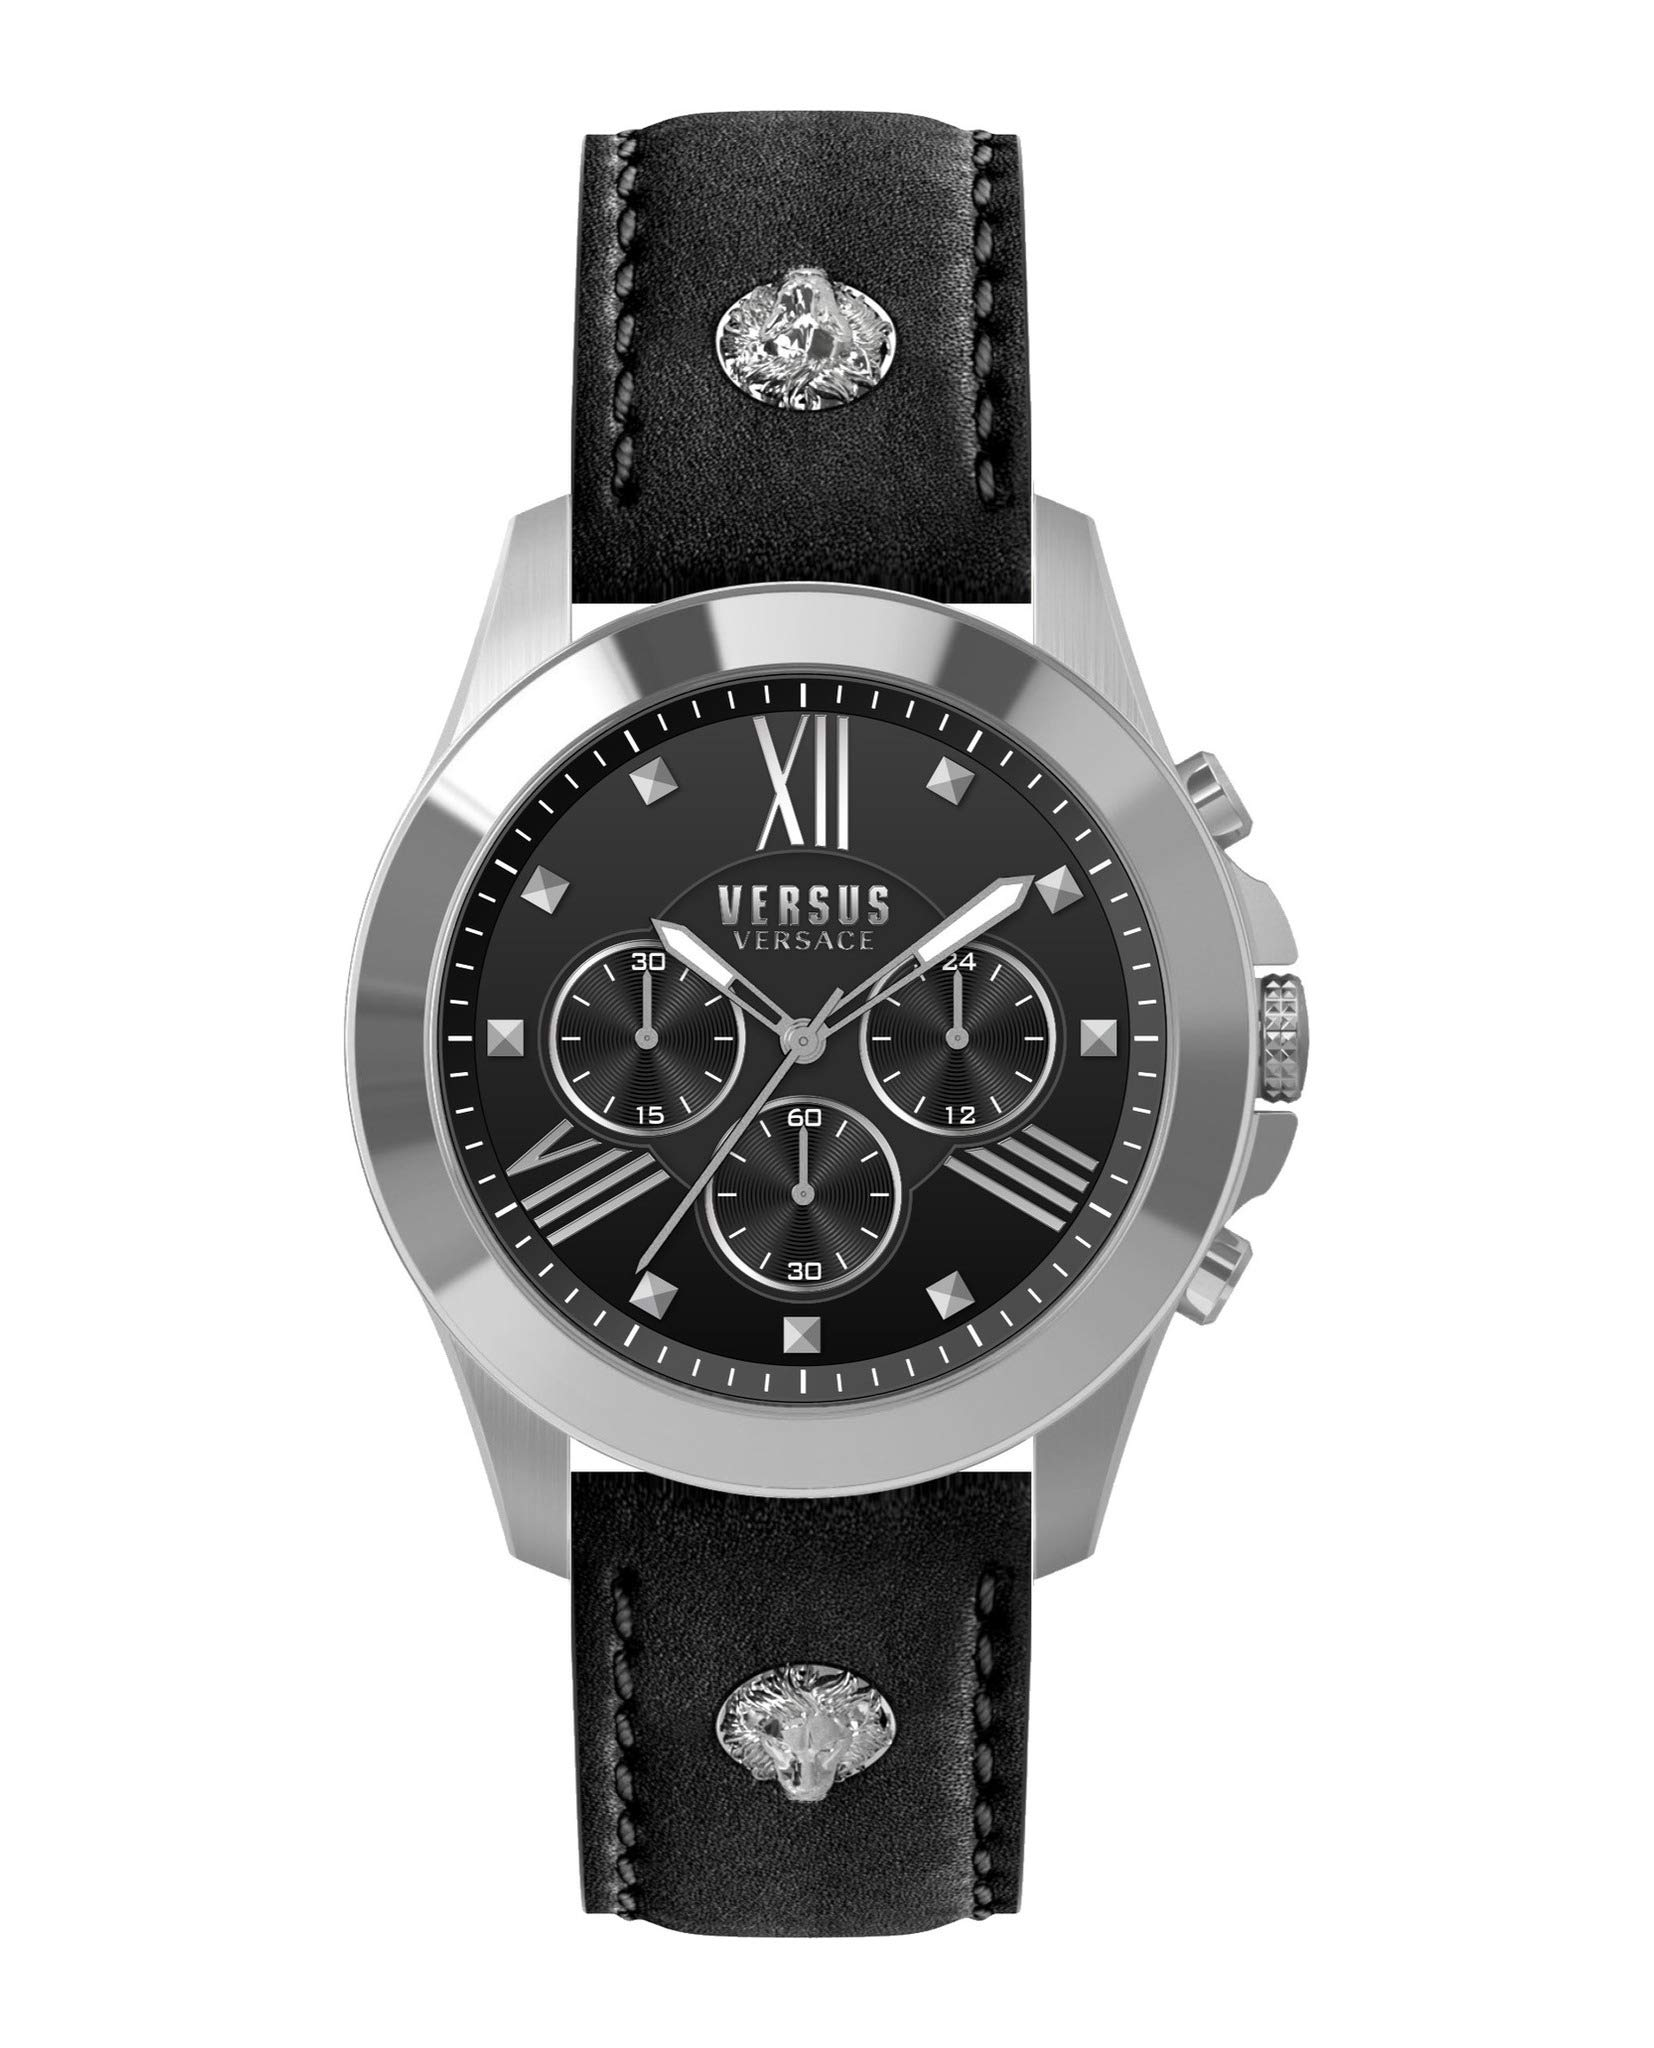 Versus Versace Mens Chrono Lion Watch VSPBH4118 by Versus Versace